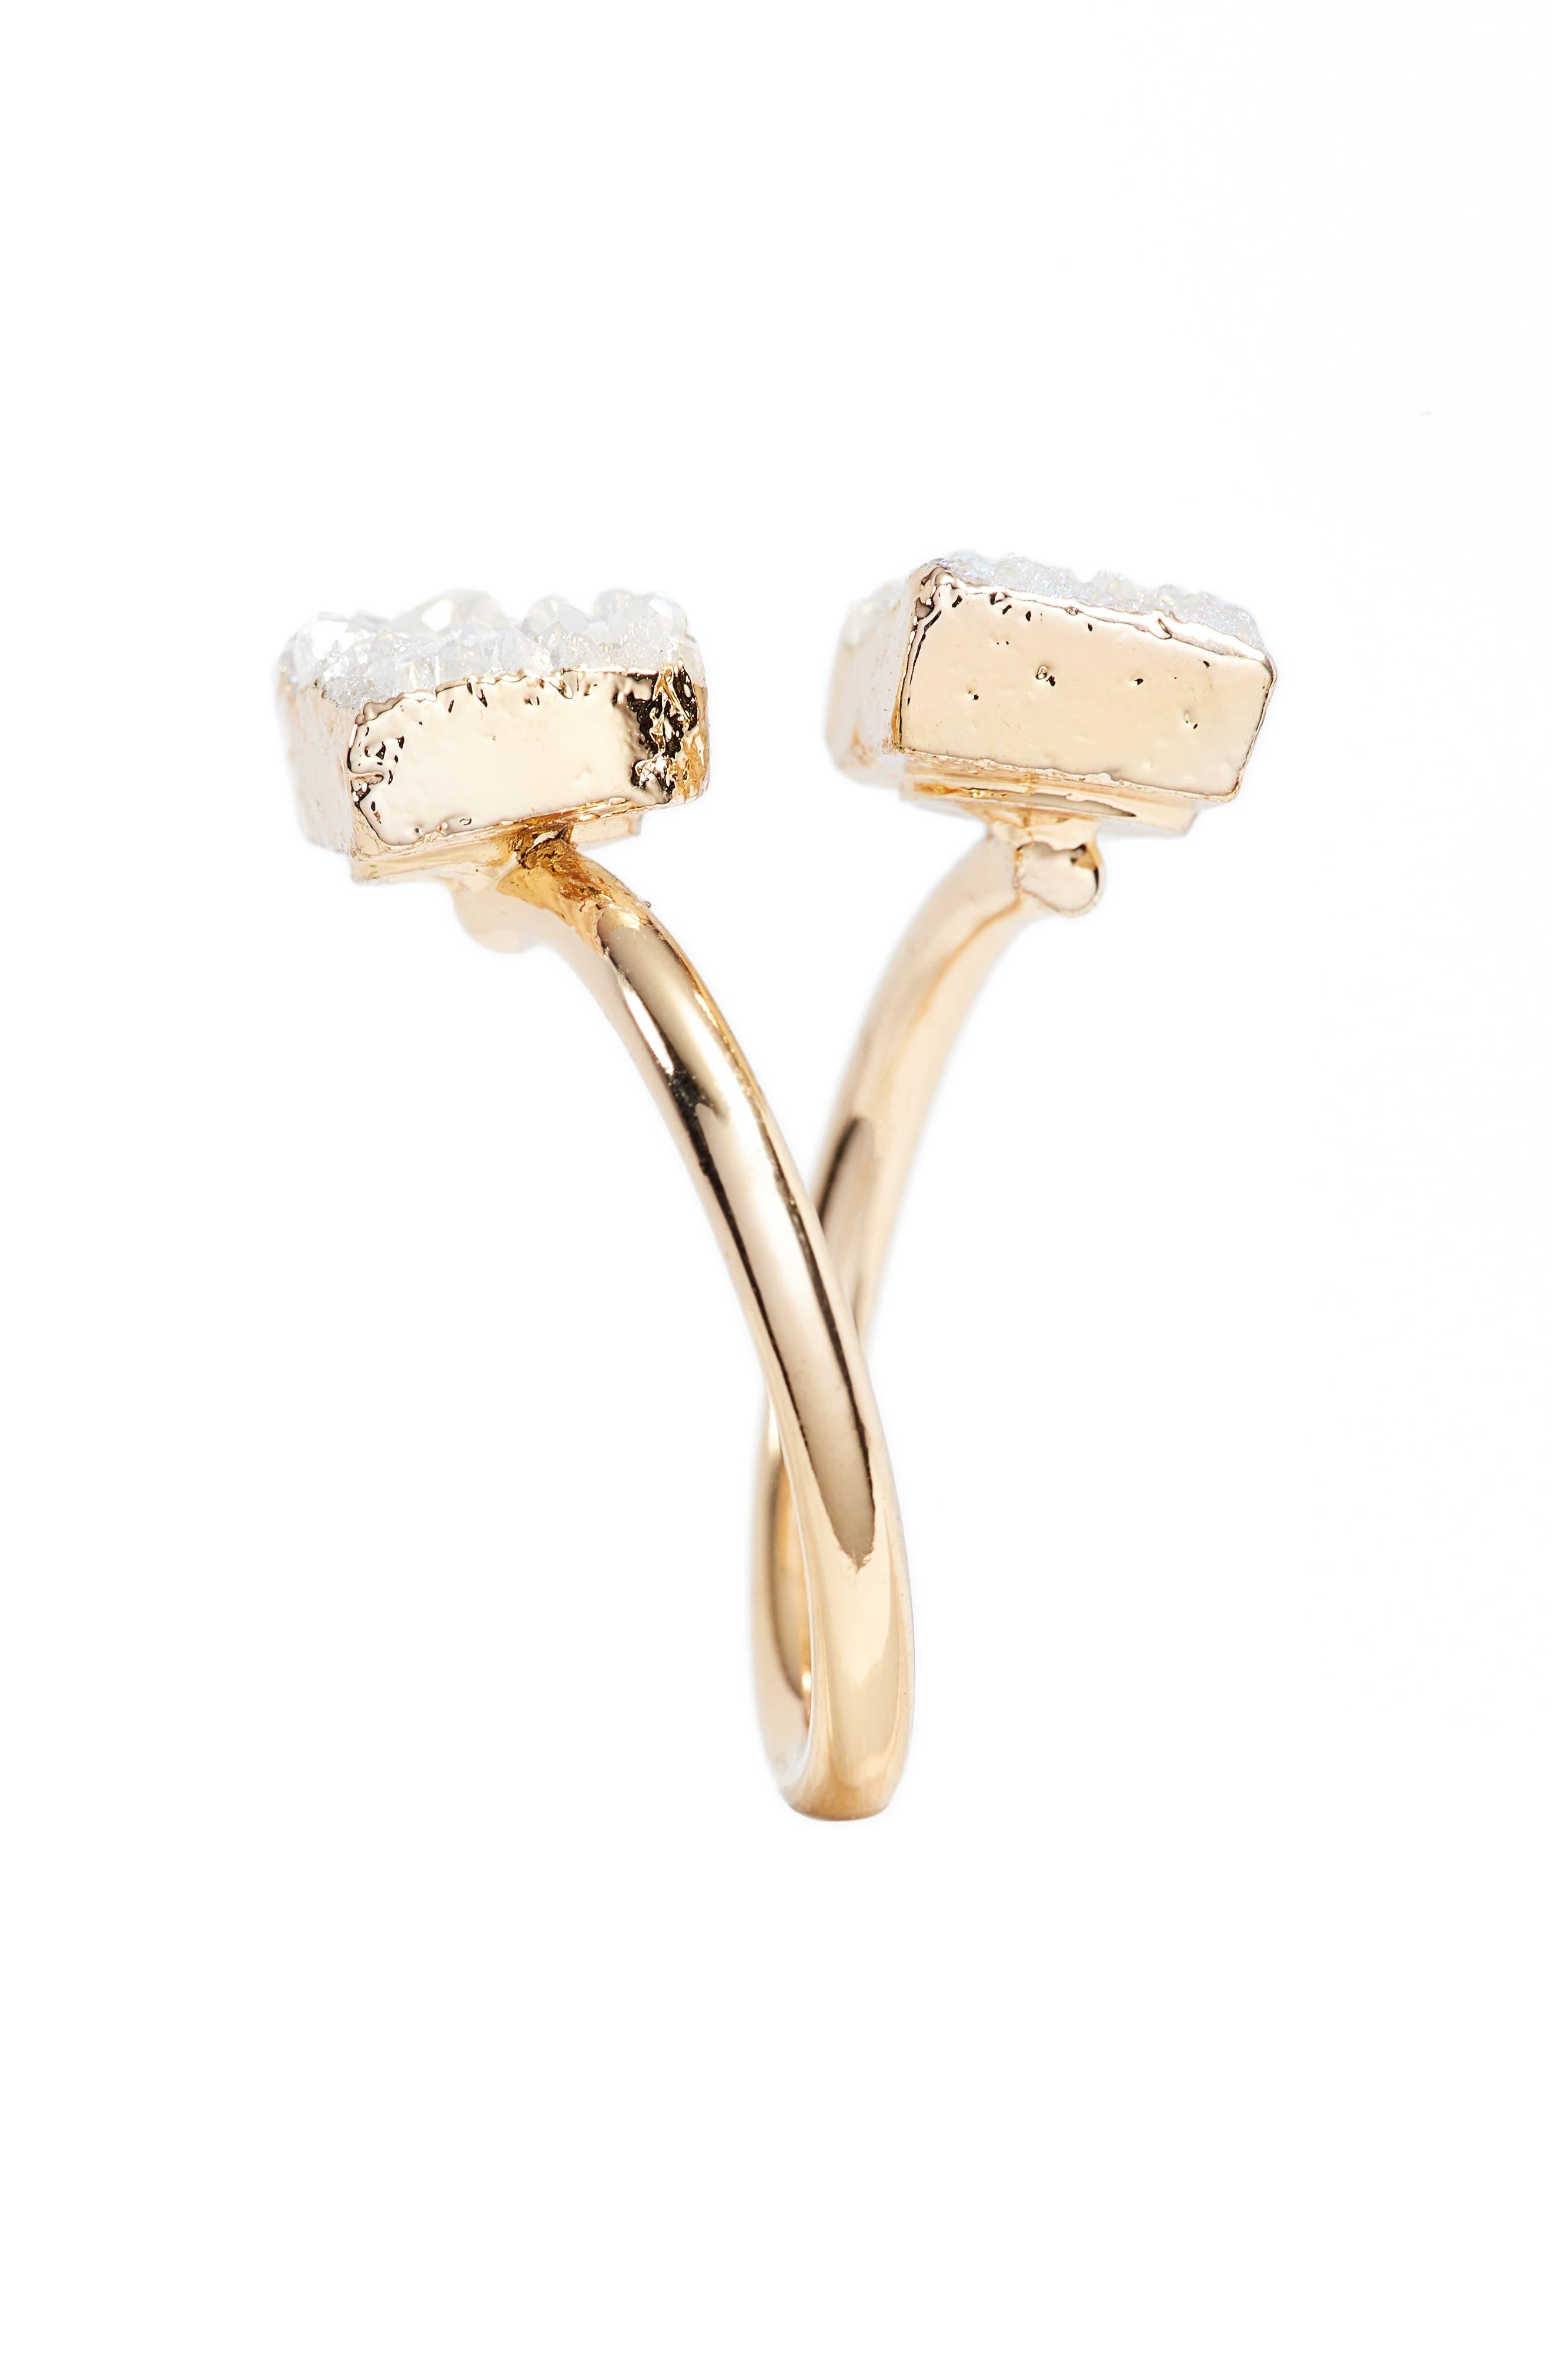 Jessa Drusy Quartz Adjustable Ring,                             Alternate thumbnail 2, color,                             250